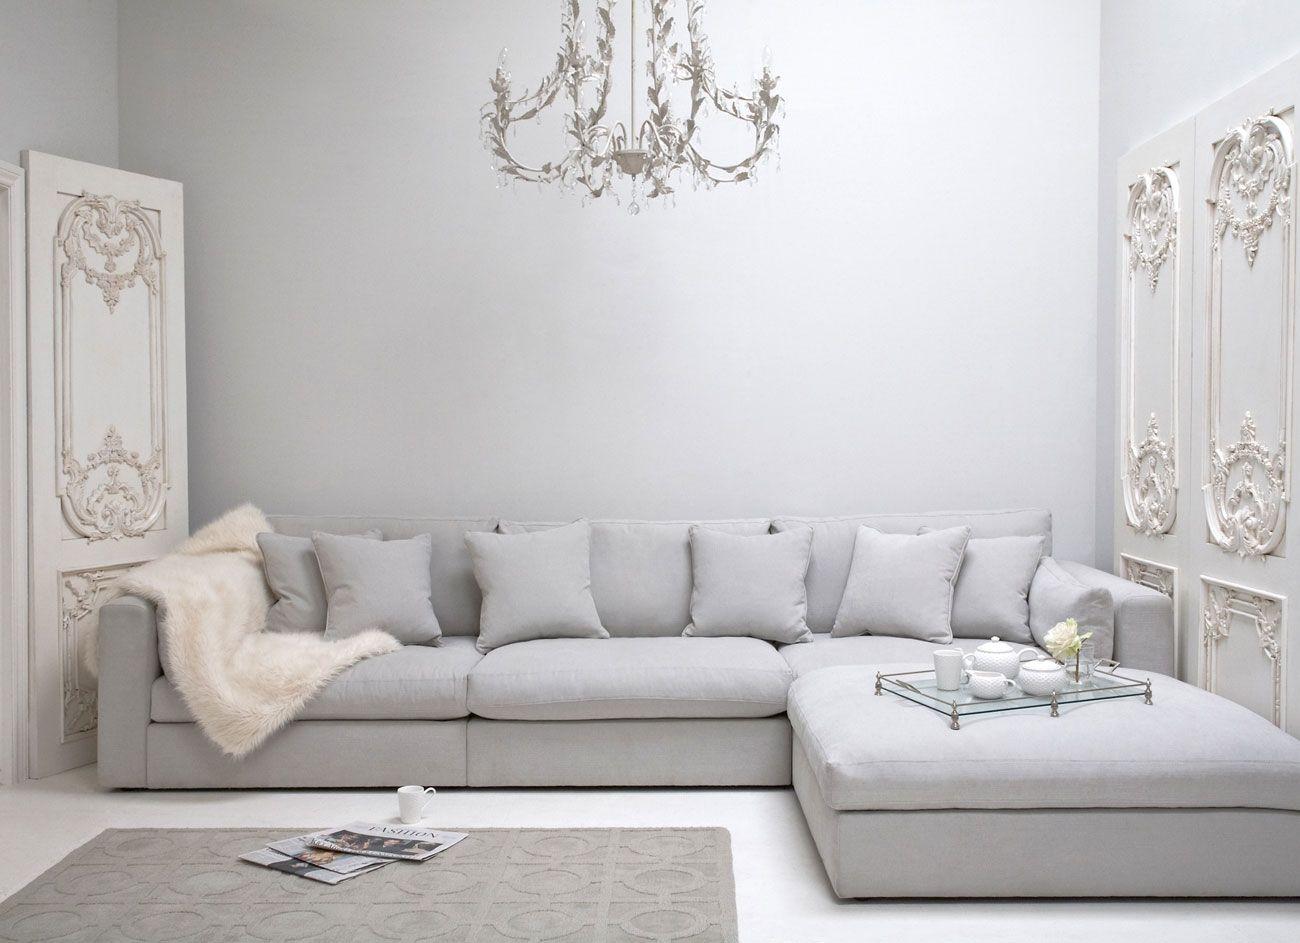 Sweet pea willow corner sofa